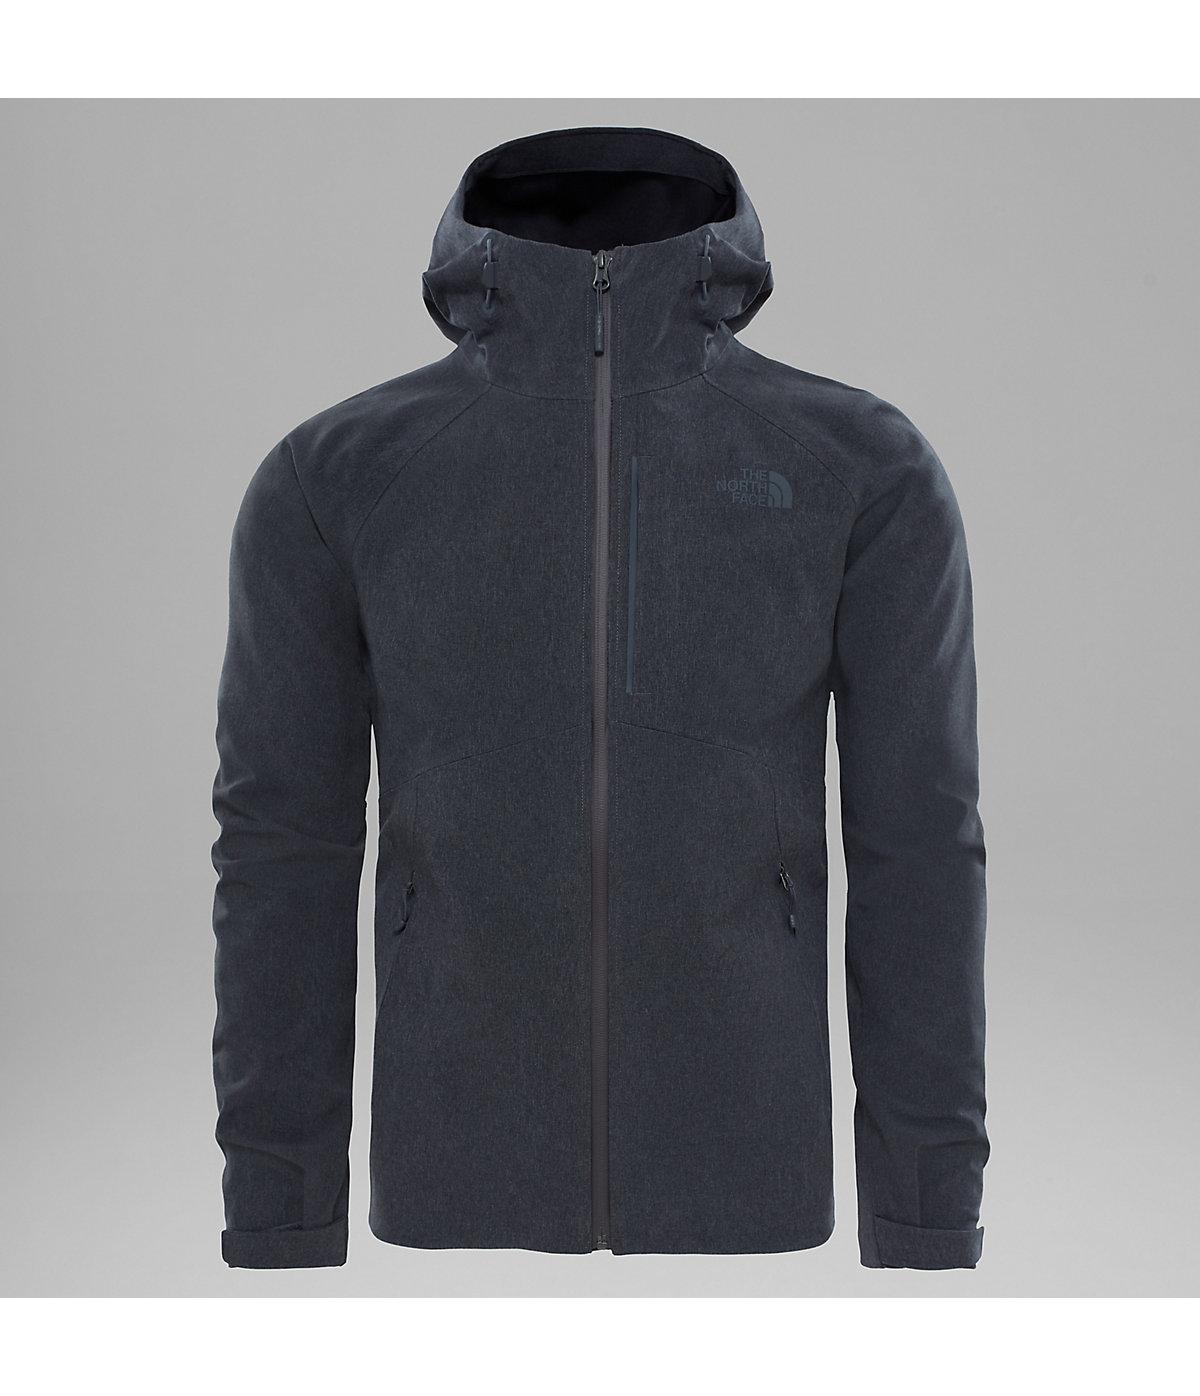 Куртка The North Face Apex Flex GTX